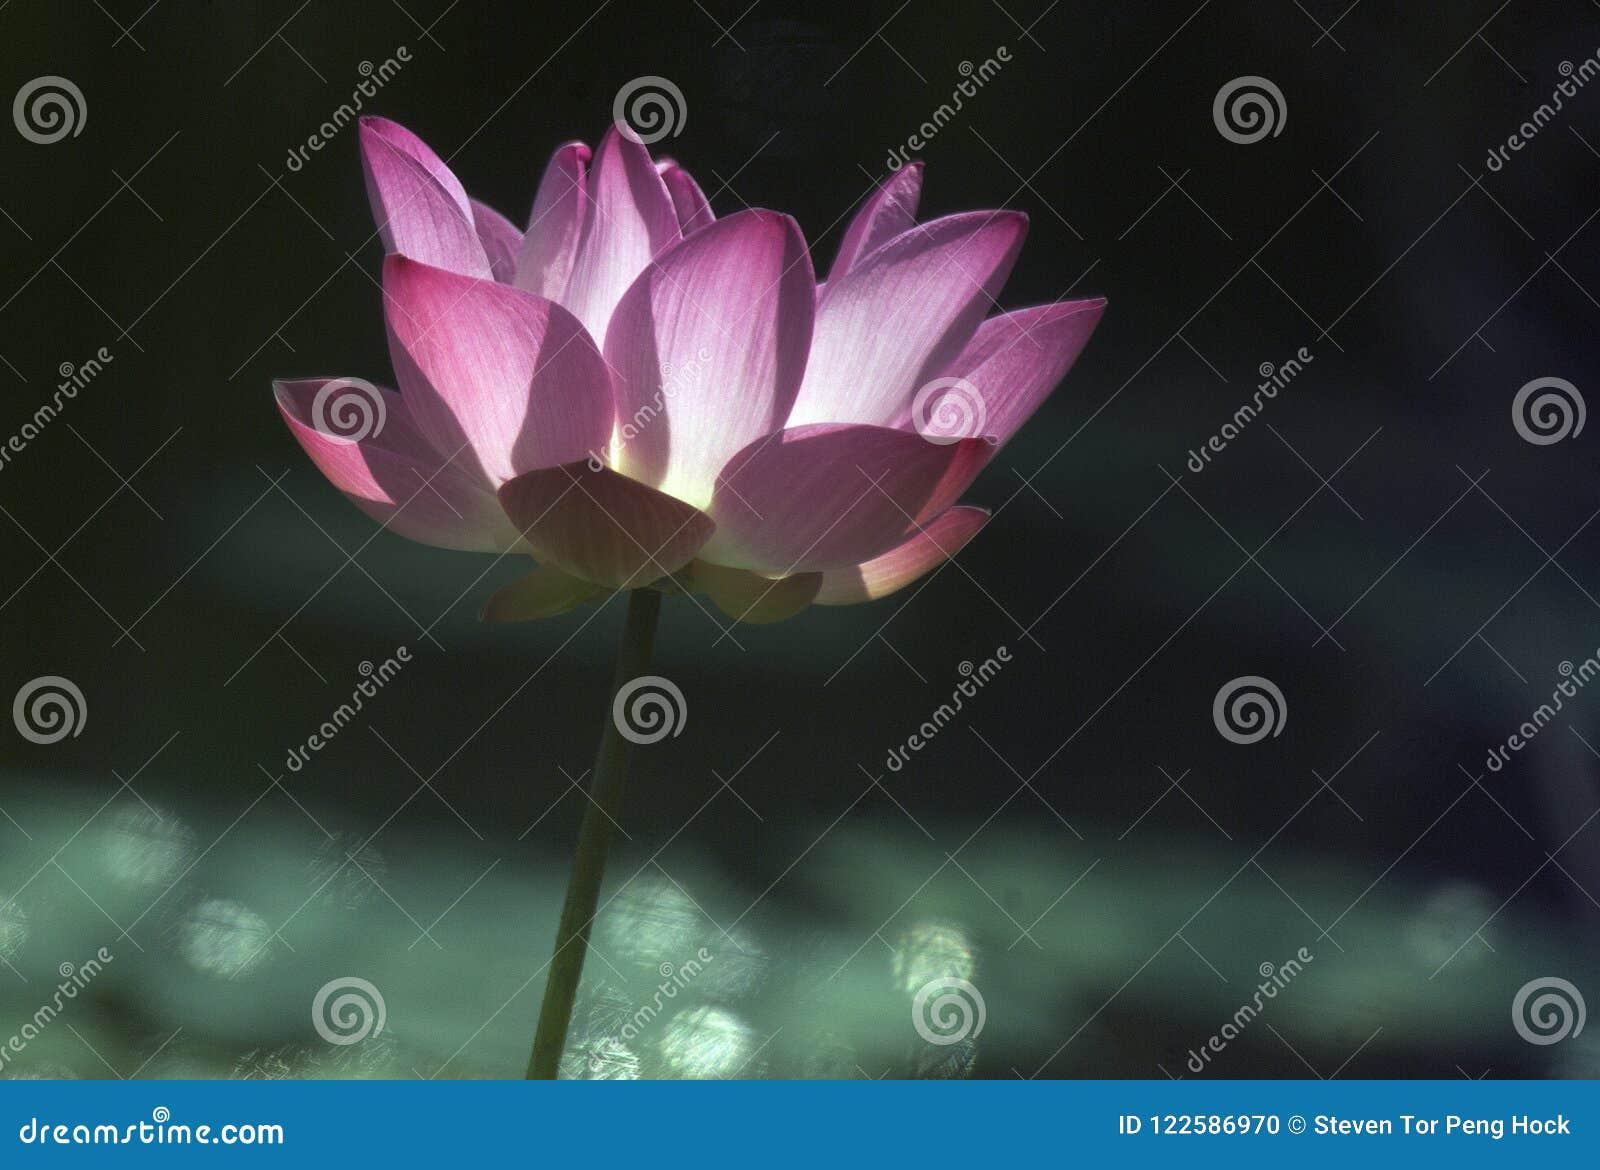 Lotus flower in sun stock photo image of color india 122586970 lotus flower in sun izmirmasajfo